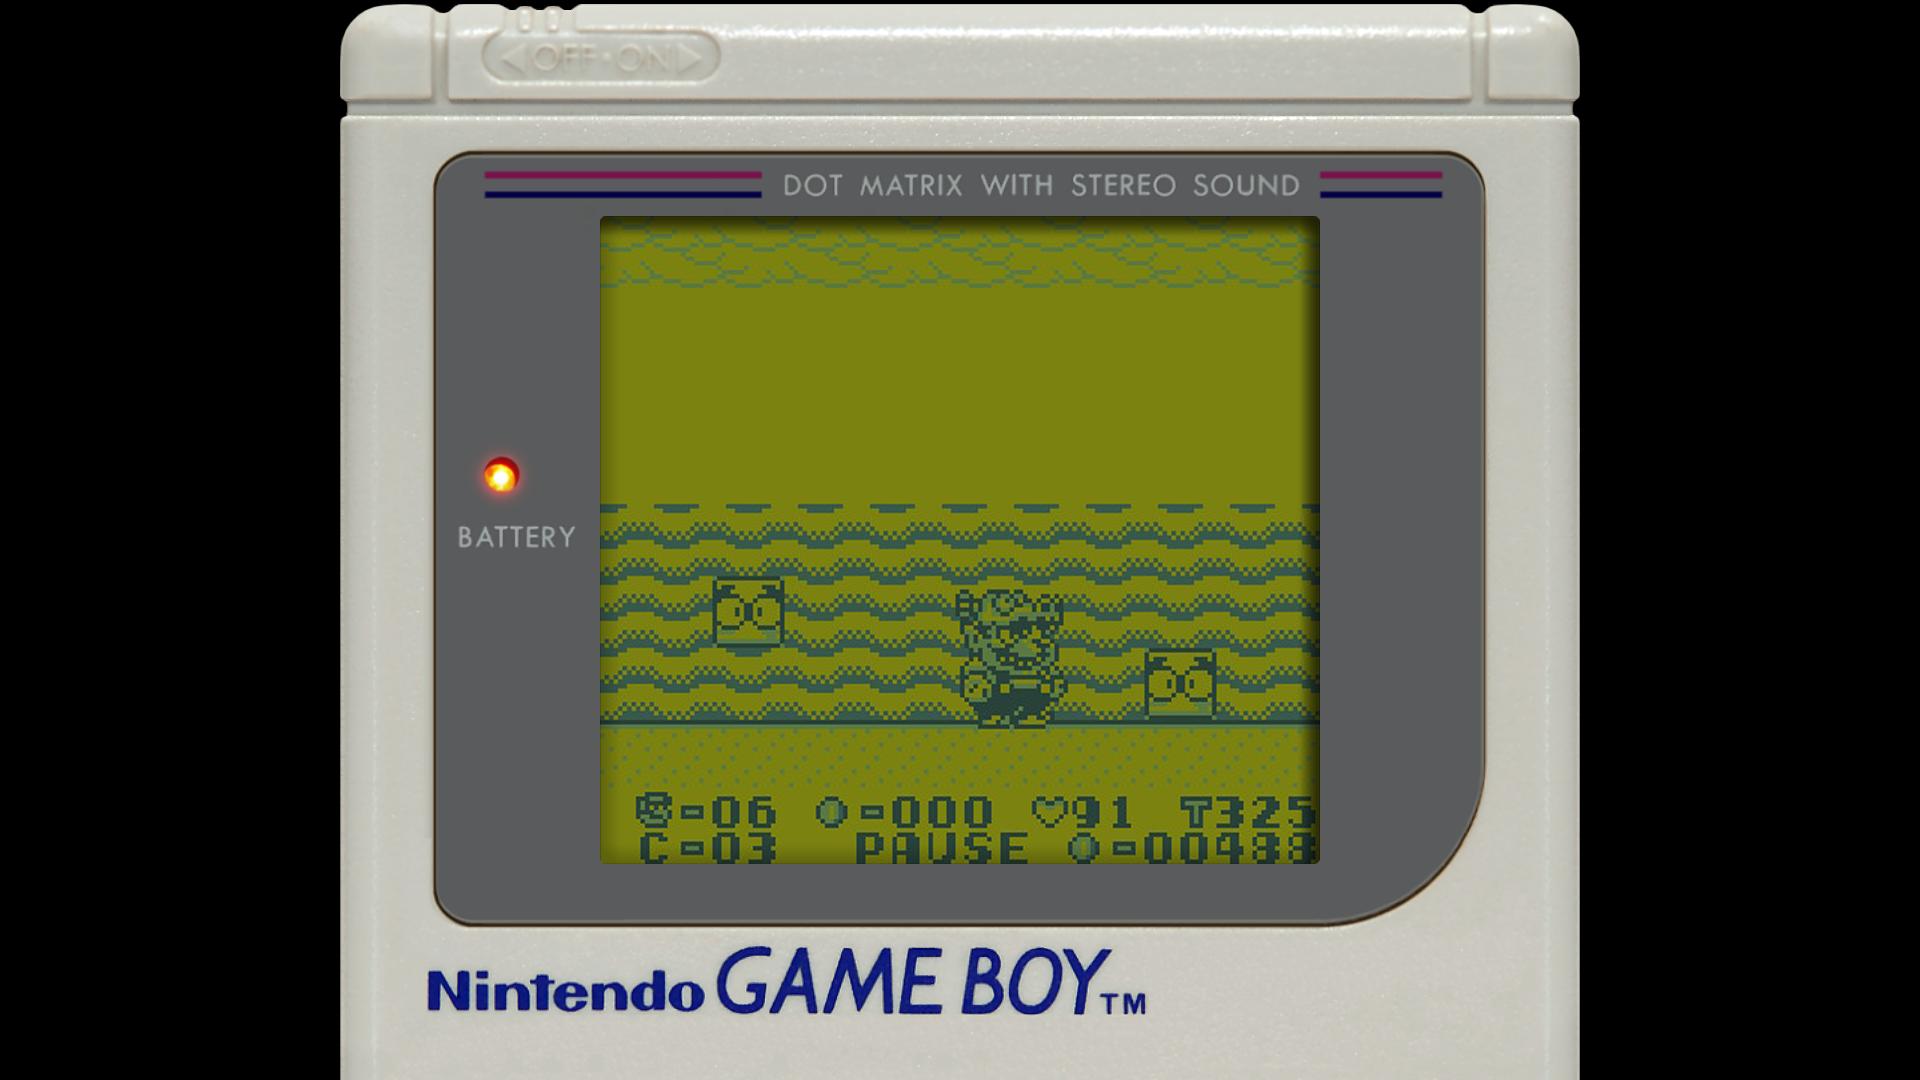 Nintendo - GameBoy CLASSIC v2.0.png